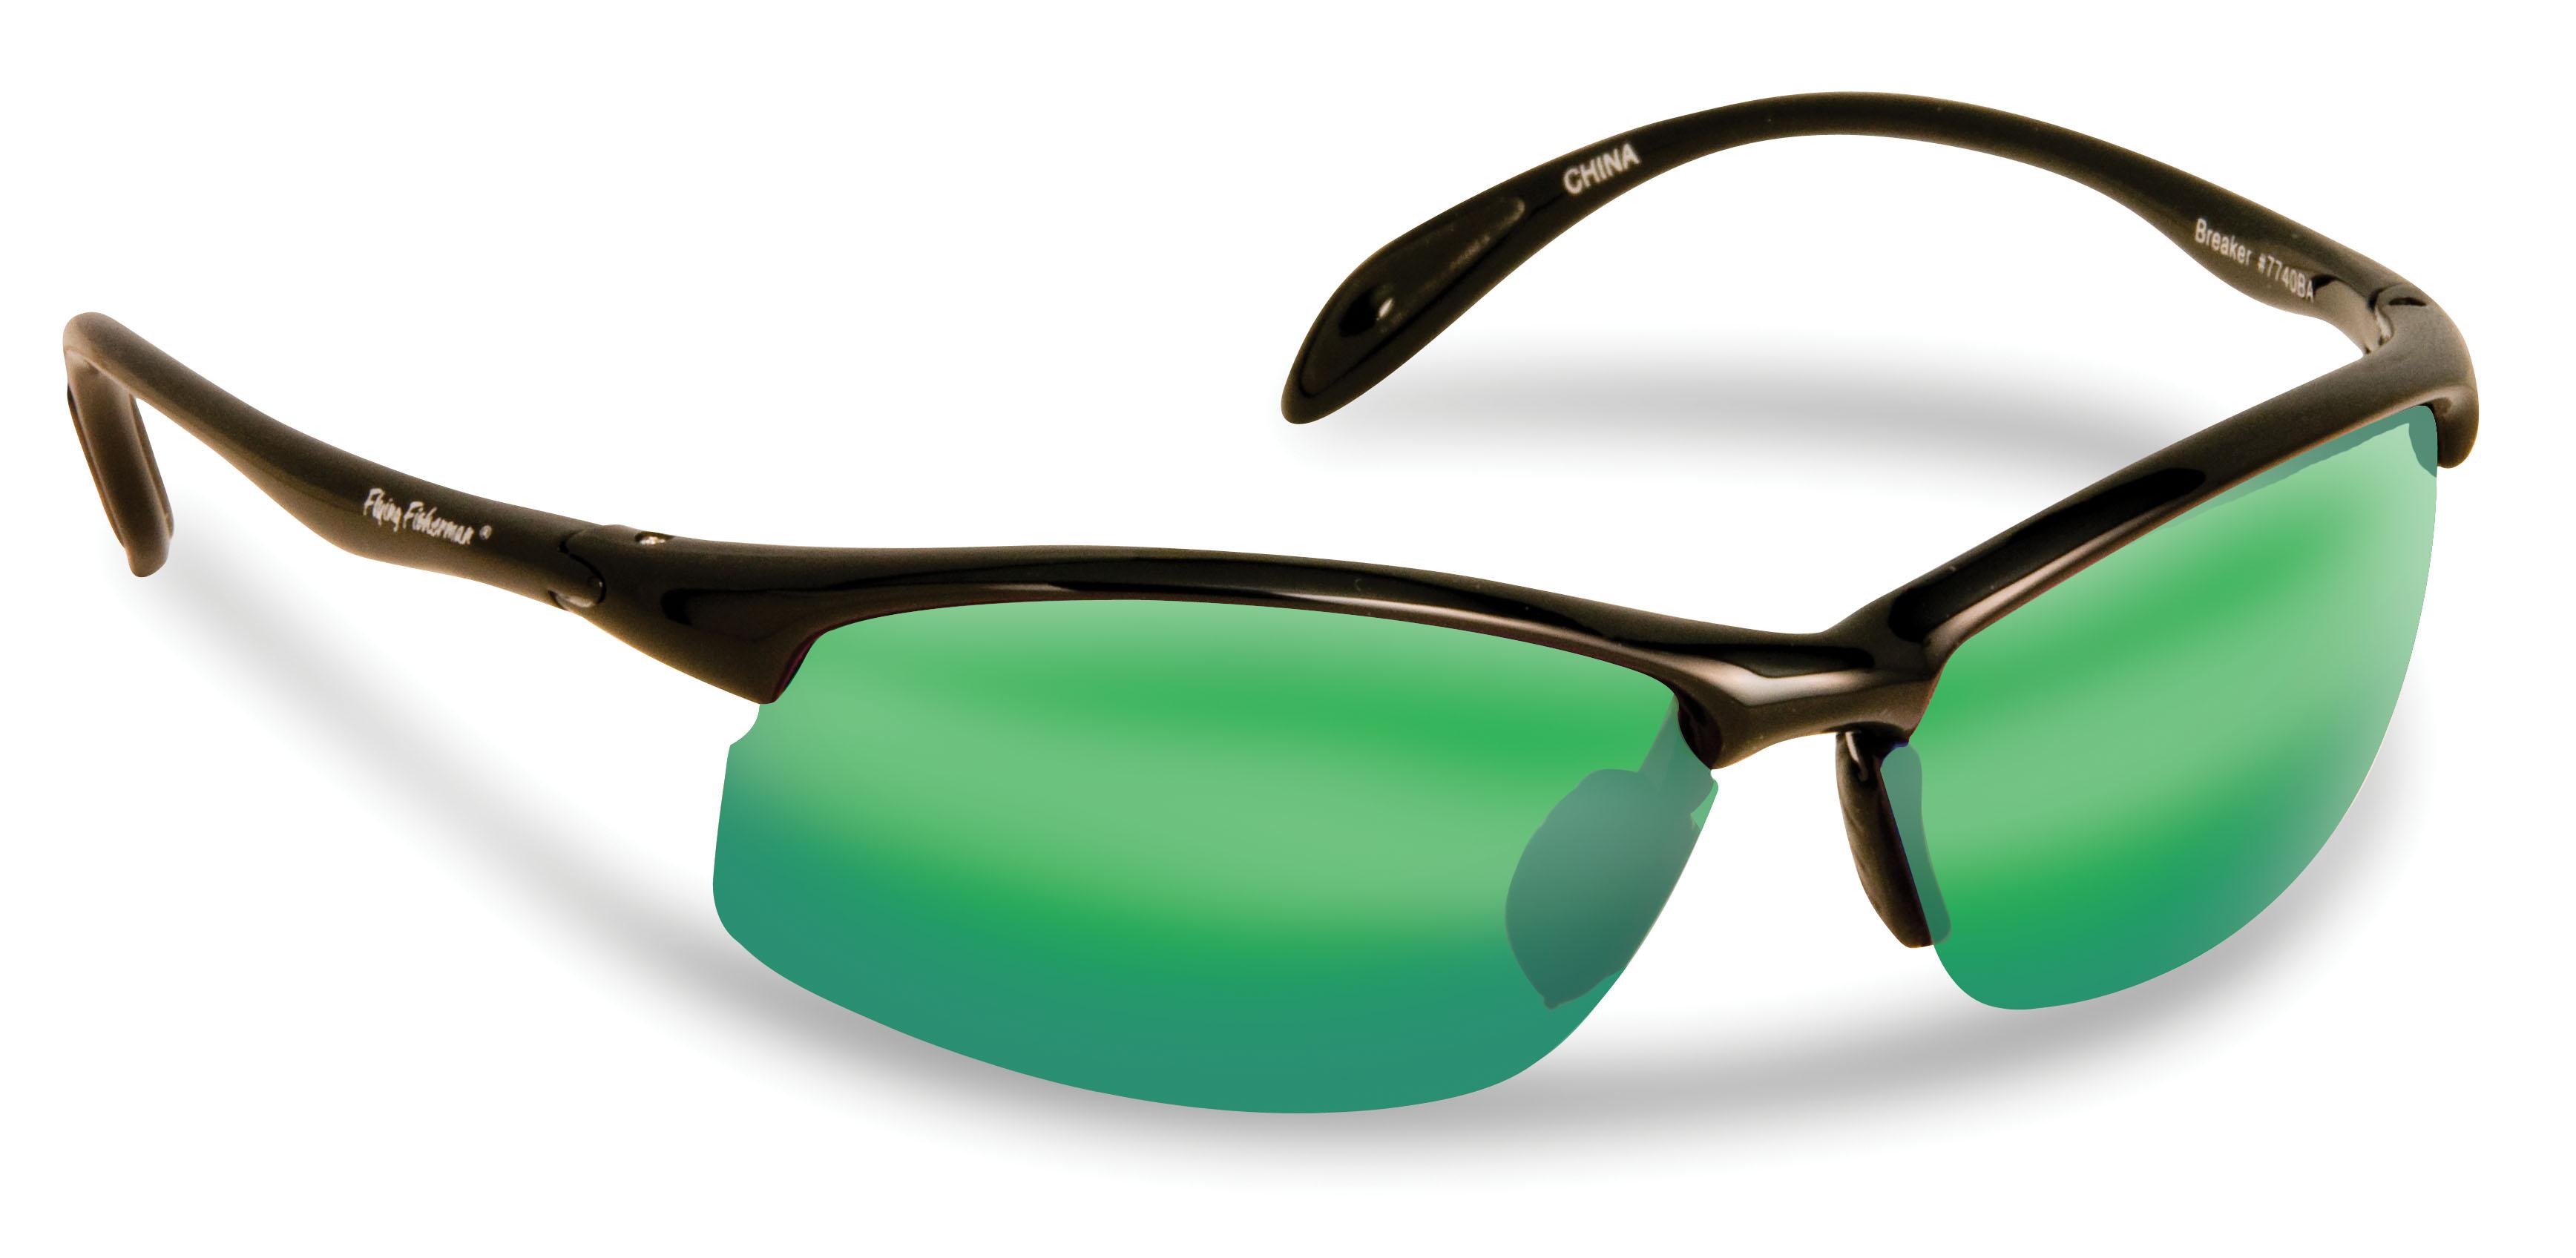 Flying fisherman breaker sunglasses glasgow angling centre for Fly fishing sunglasses